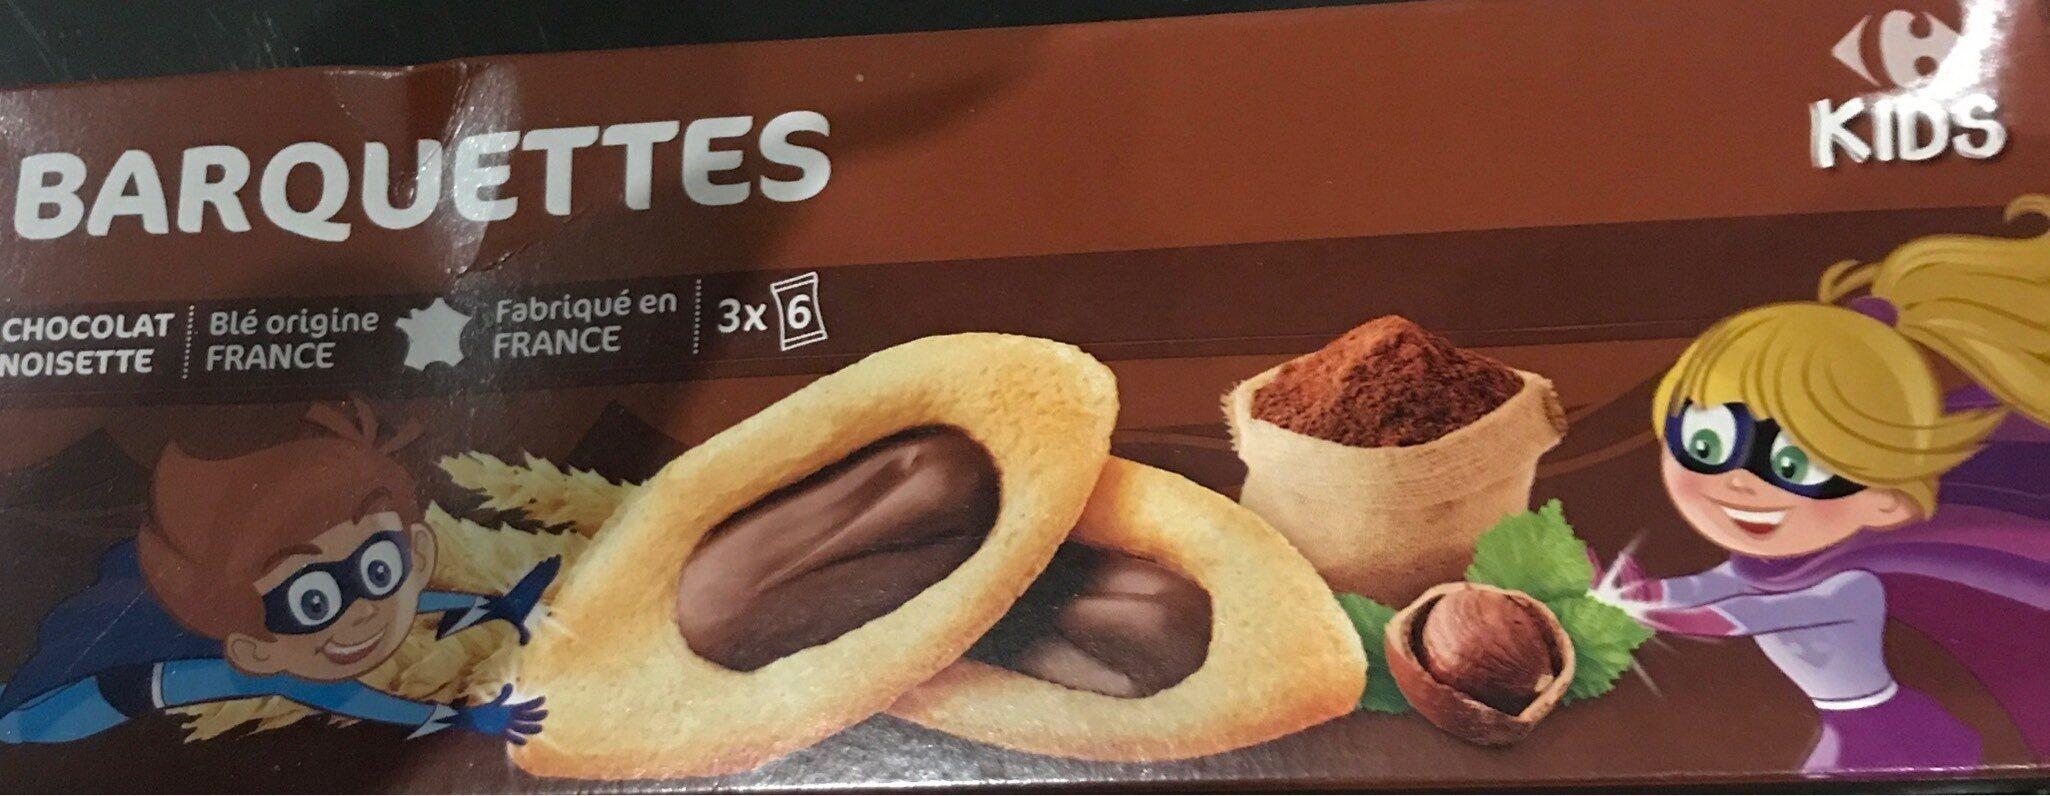 Barquettes chocolat noisette - Product - fr